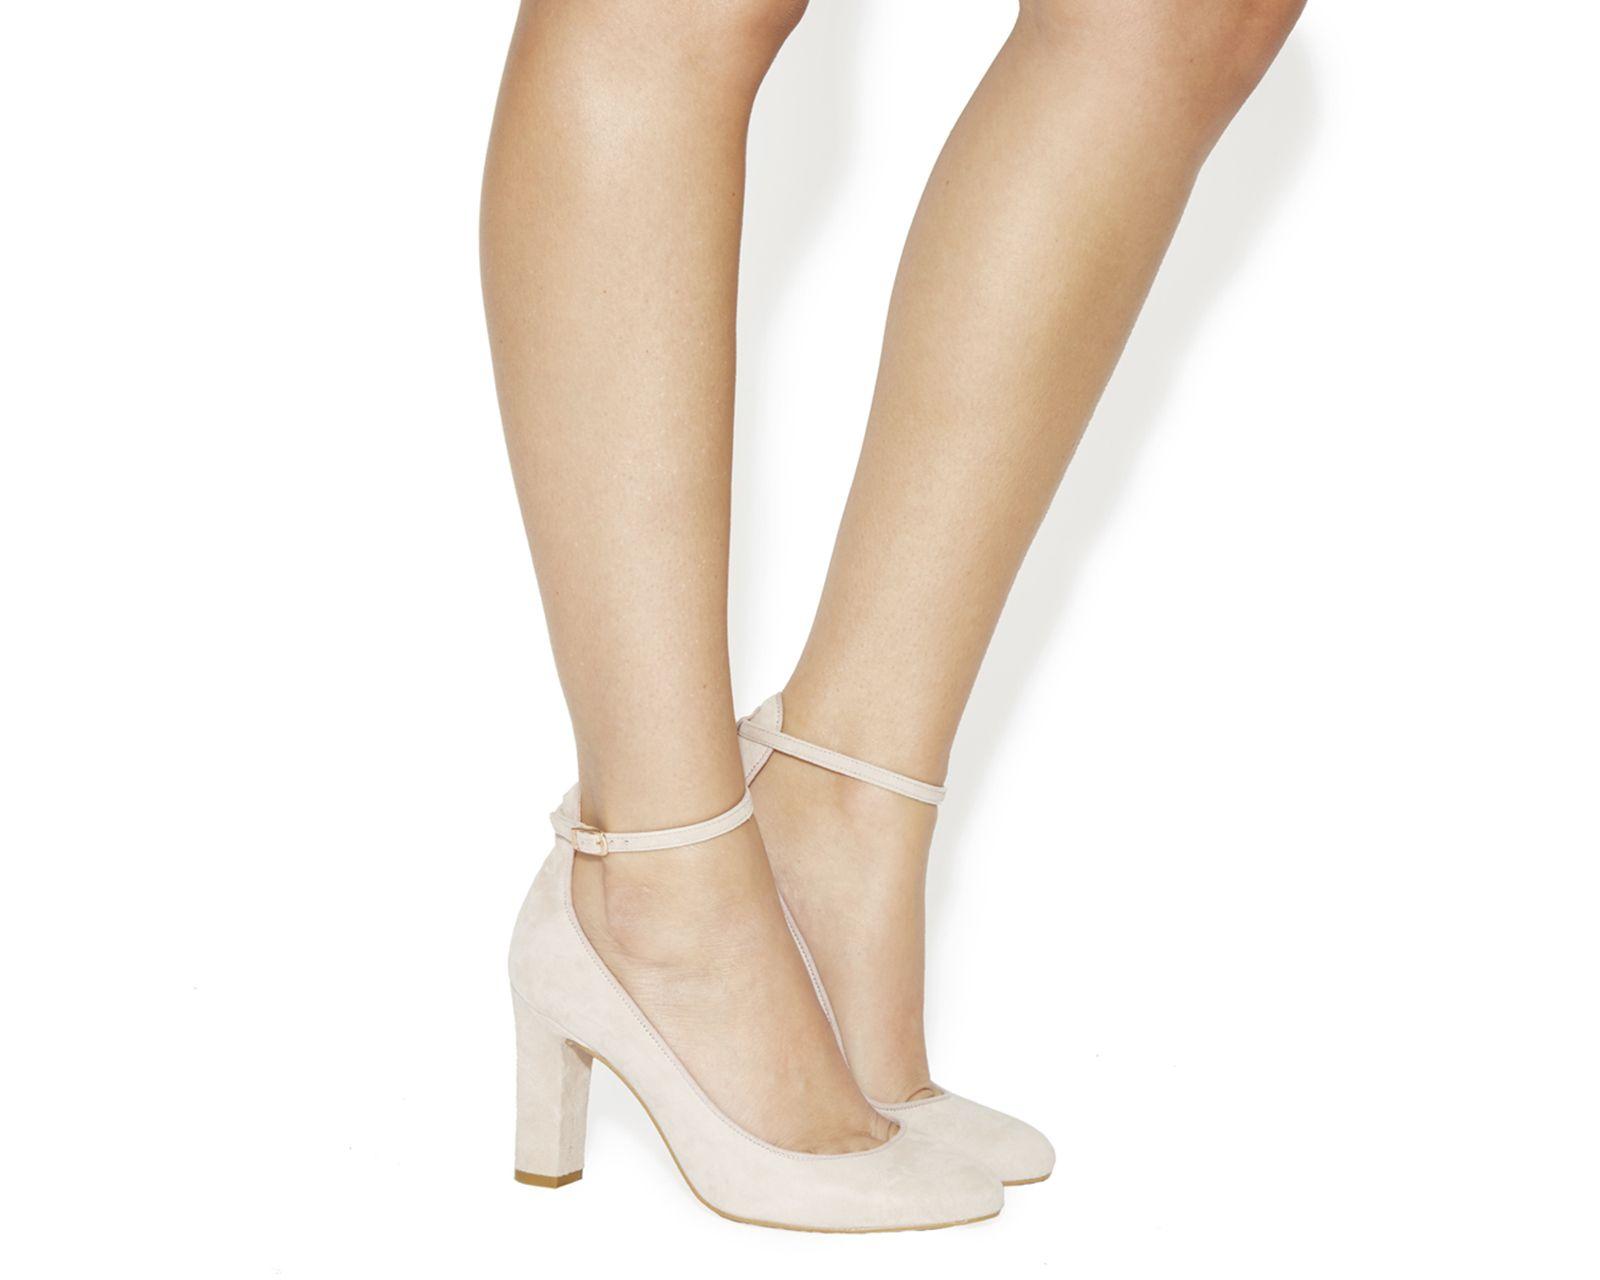 stilettos online comfortable cream chic comforter index shoes stylish high brazil heel studded women buy heels